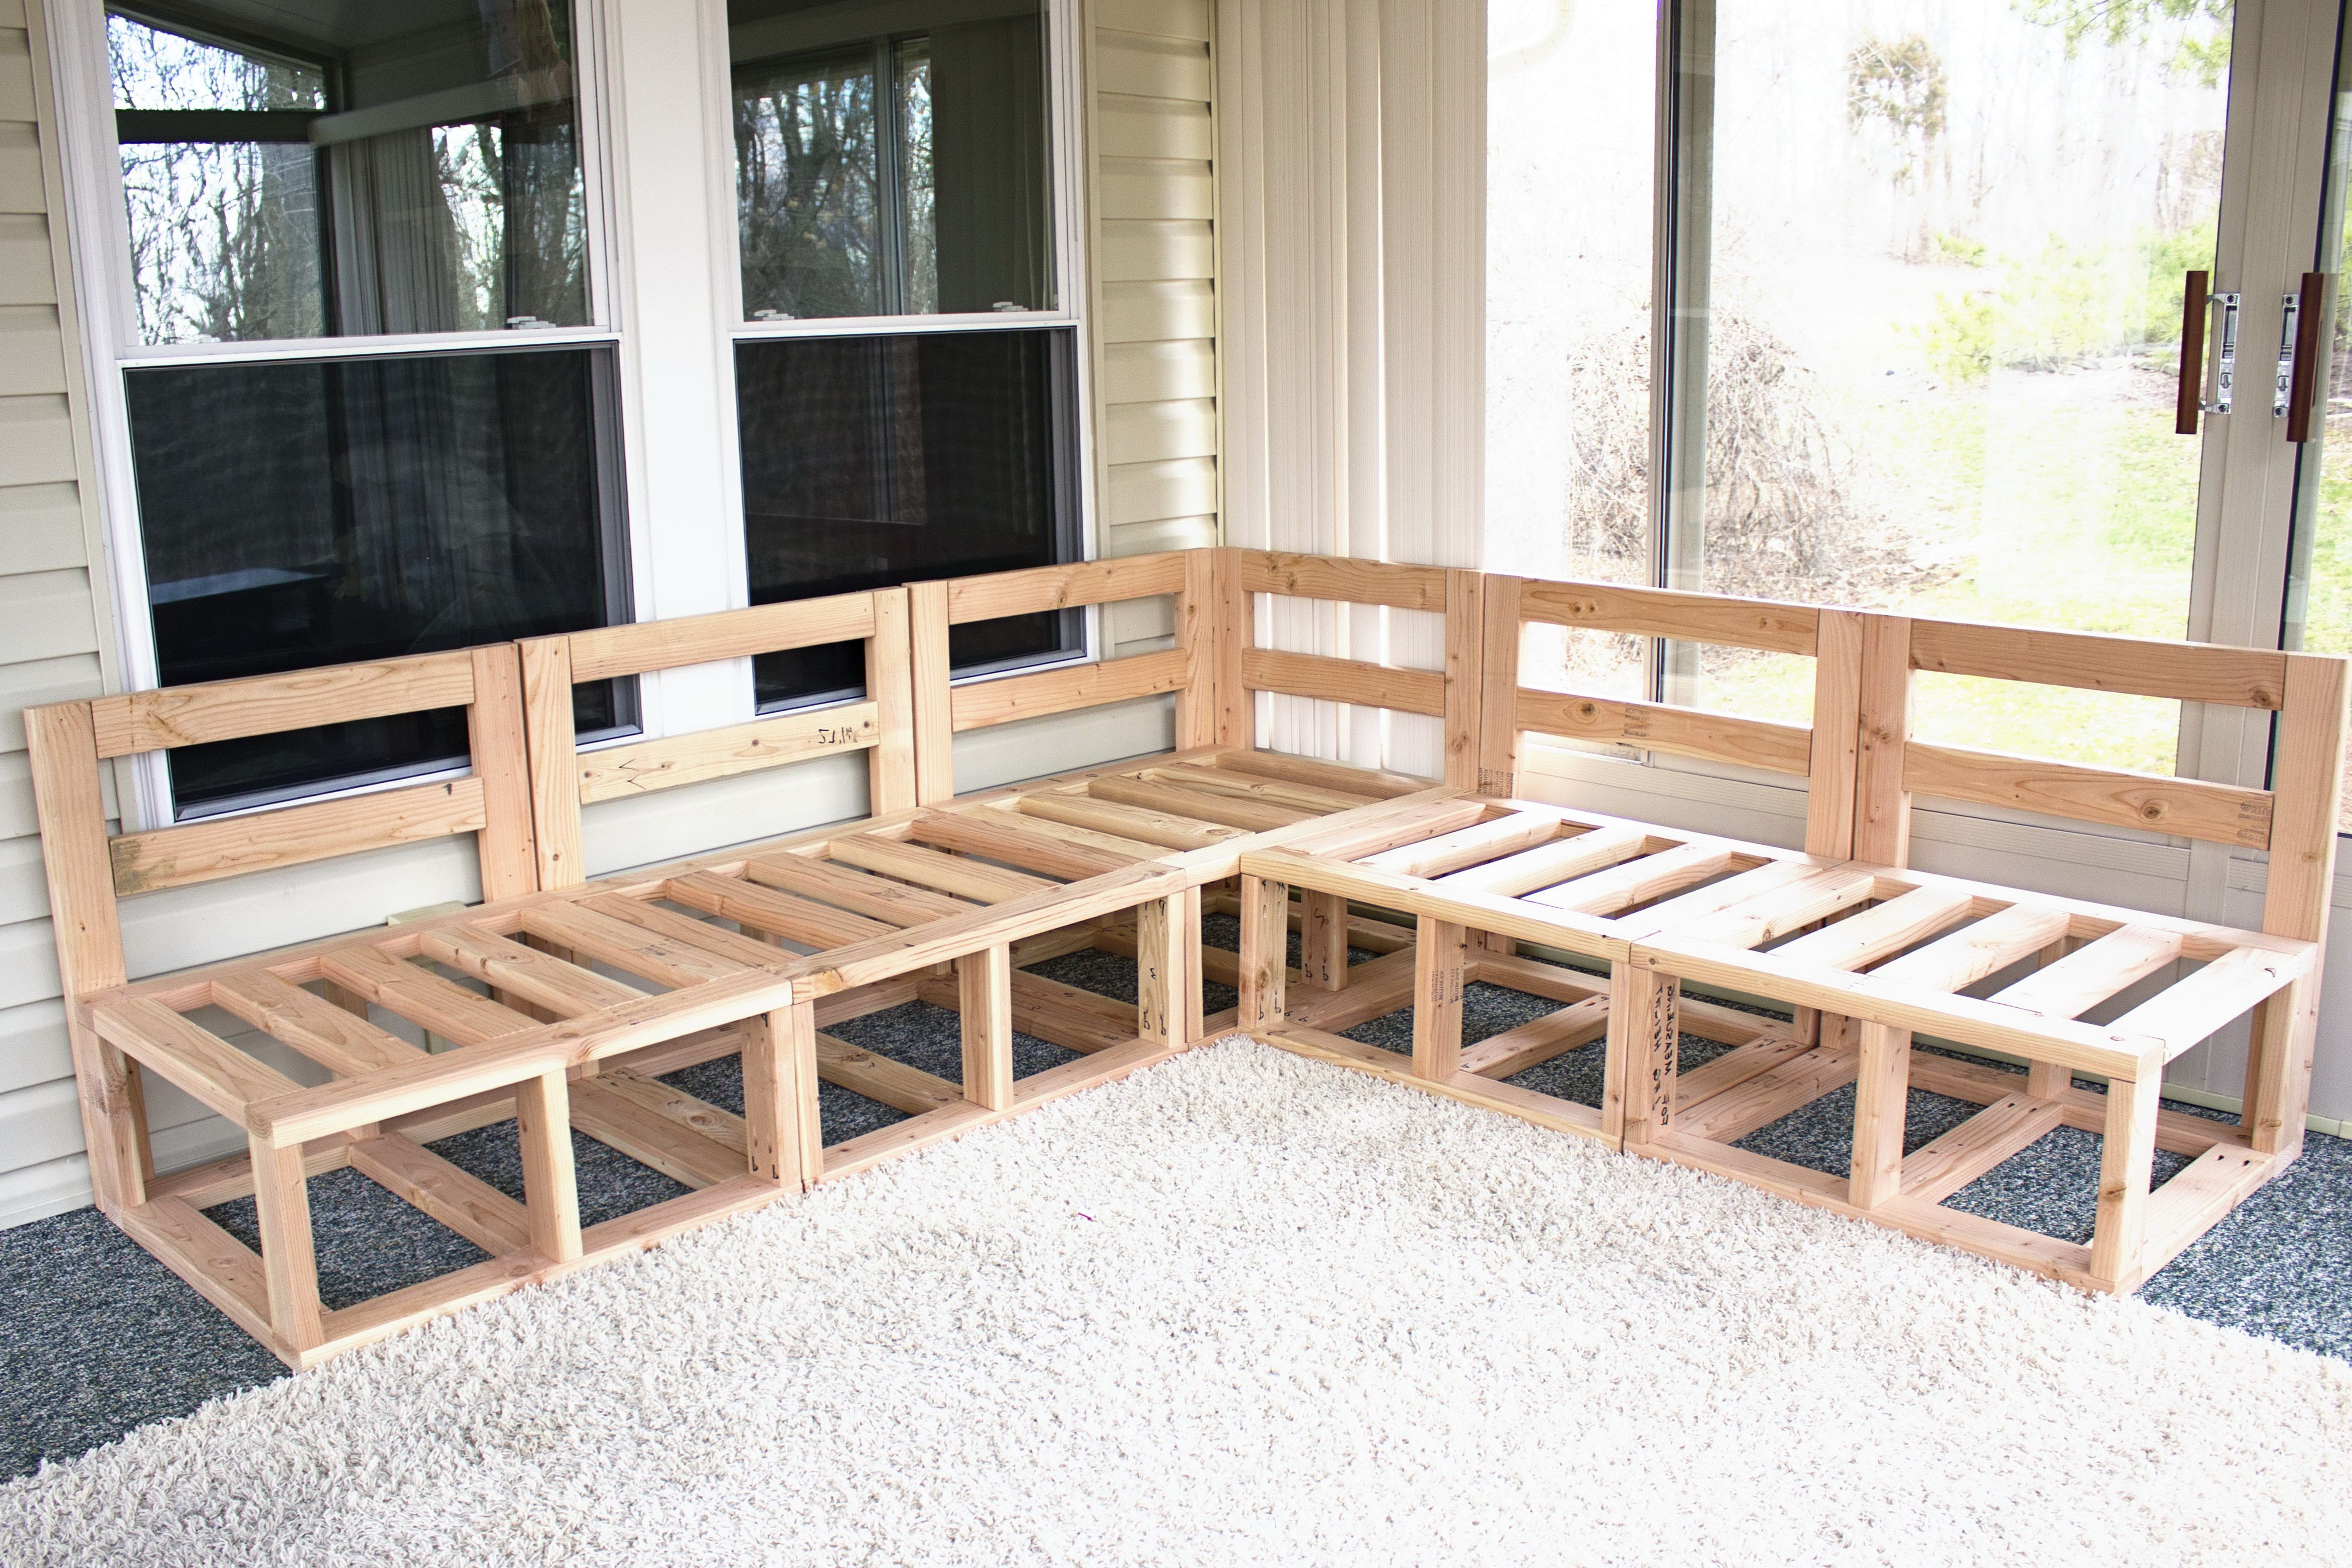 Diy Outdoor Sectional Sofa Plans Diy outdoor furniture